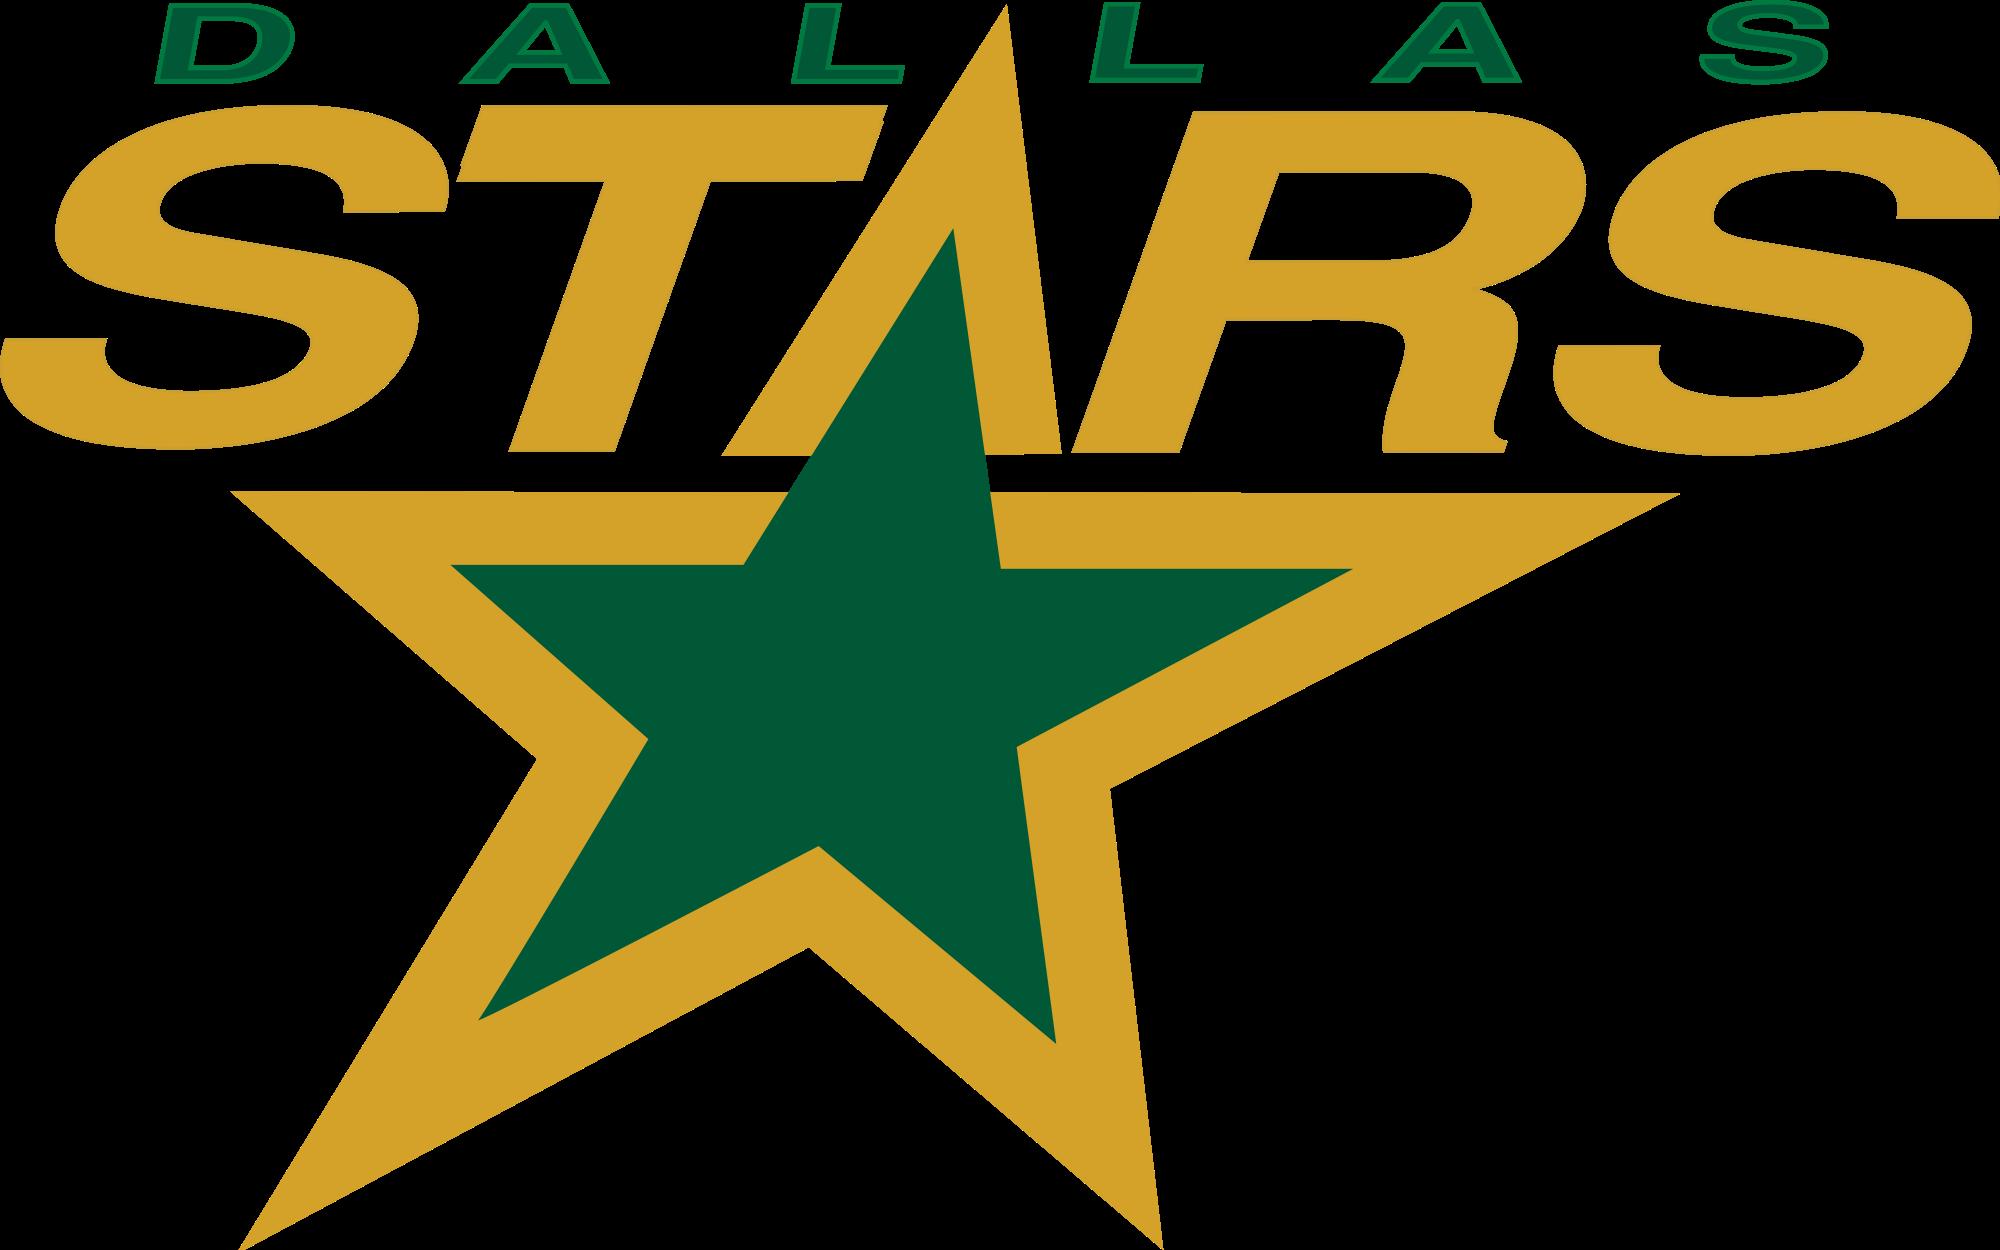 Dallas Stars Logo wallpapers HD